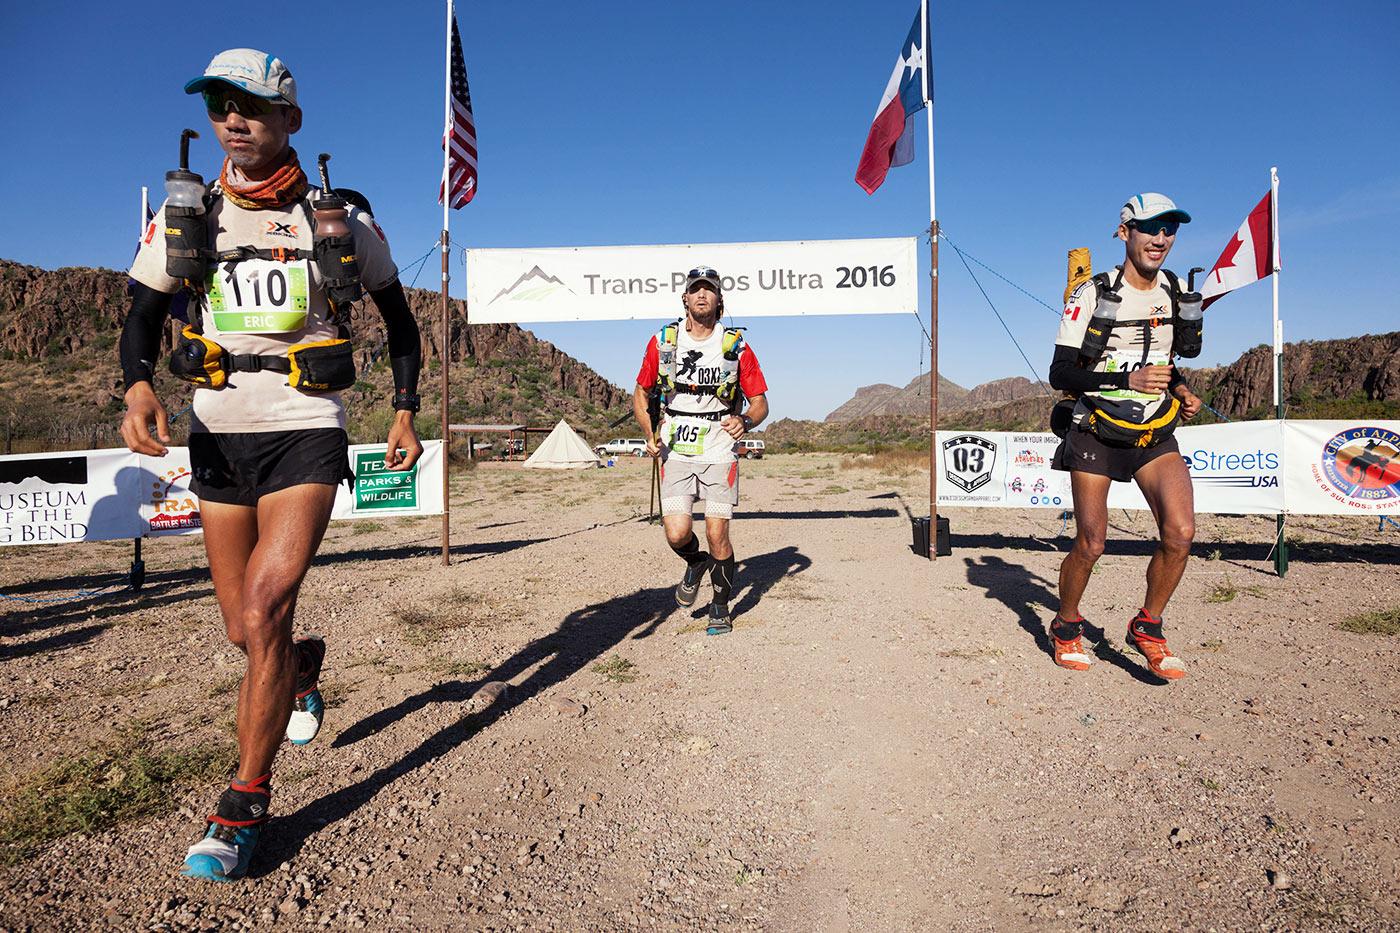 Trans-Pecos-Ultra-ABP-front-runners.jpg